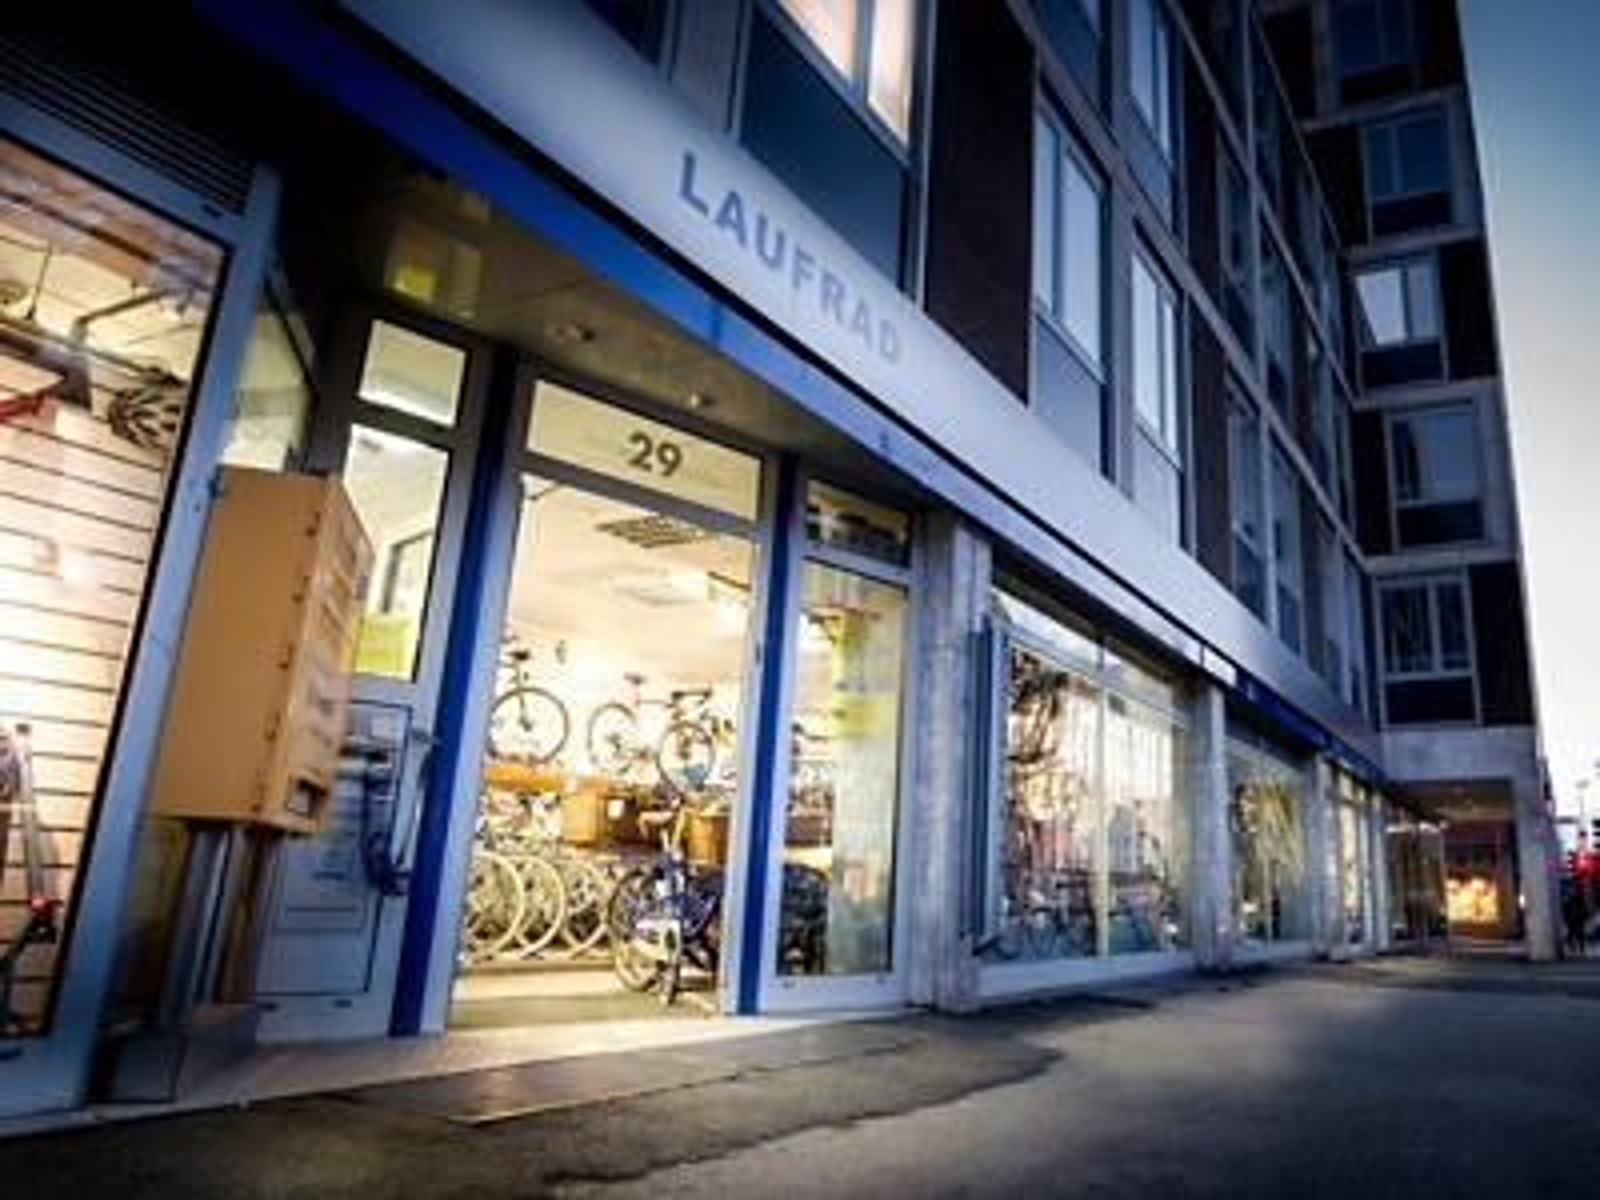 Laufrad Luebeck GmbH